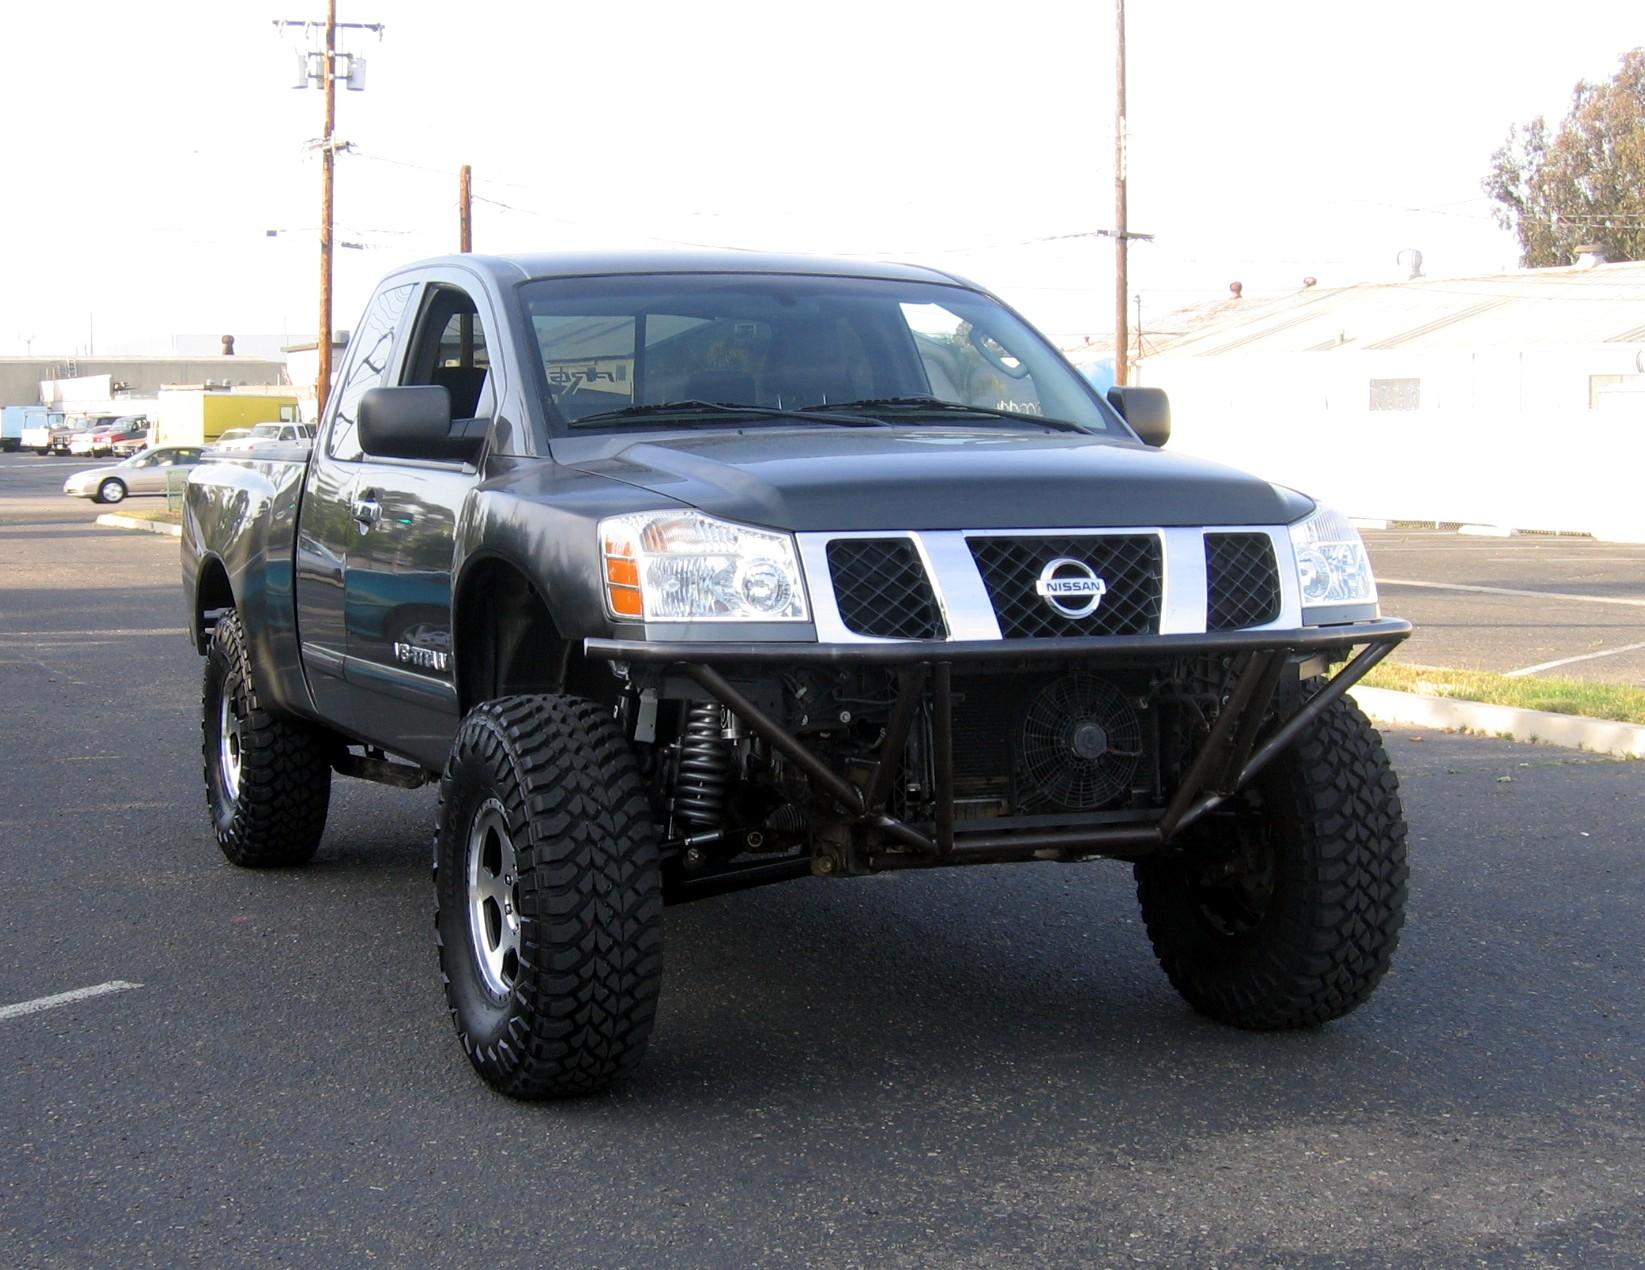 Costa Mesa Nissan >> Pre-runner bumper help - Page 2 - Nissan Titan Forum